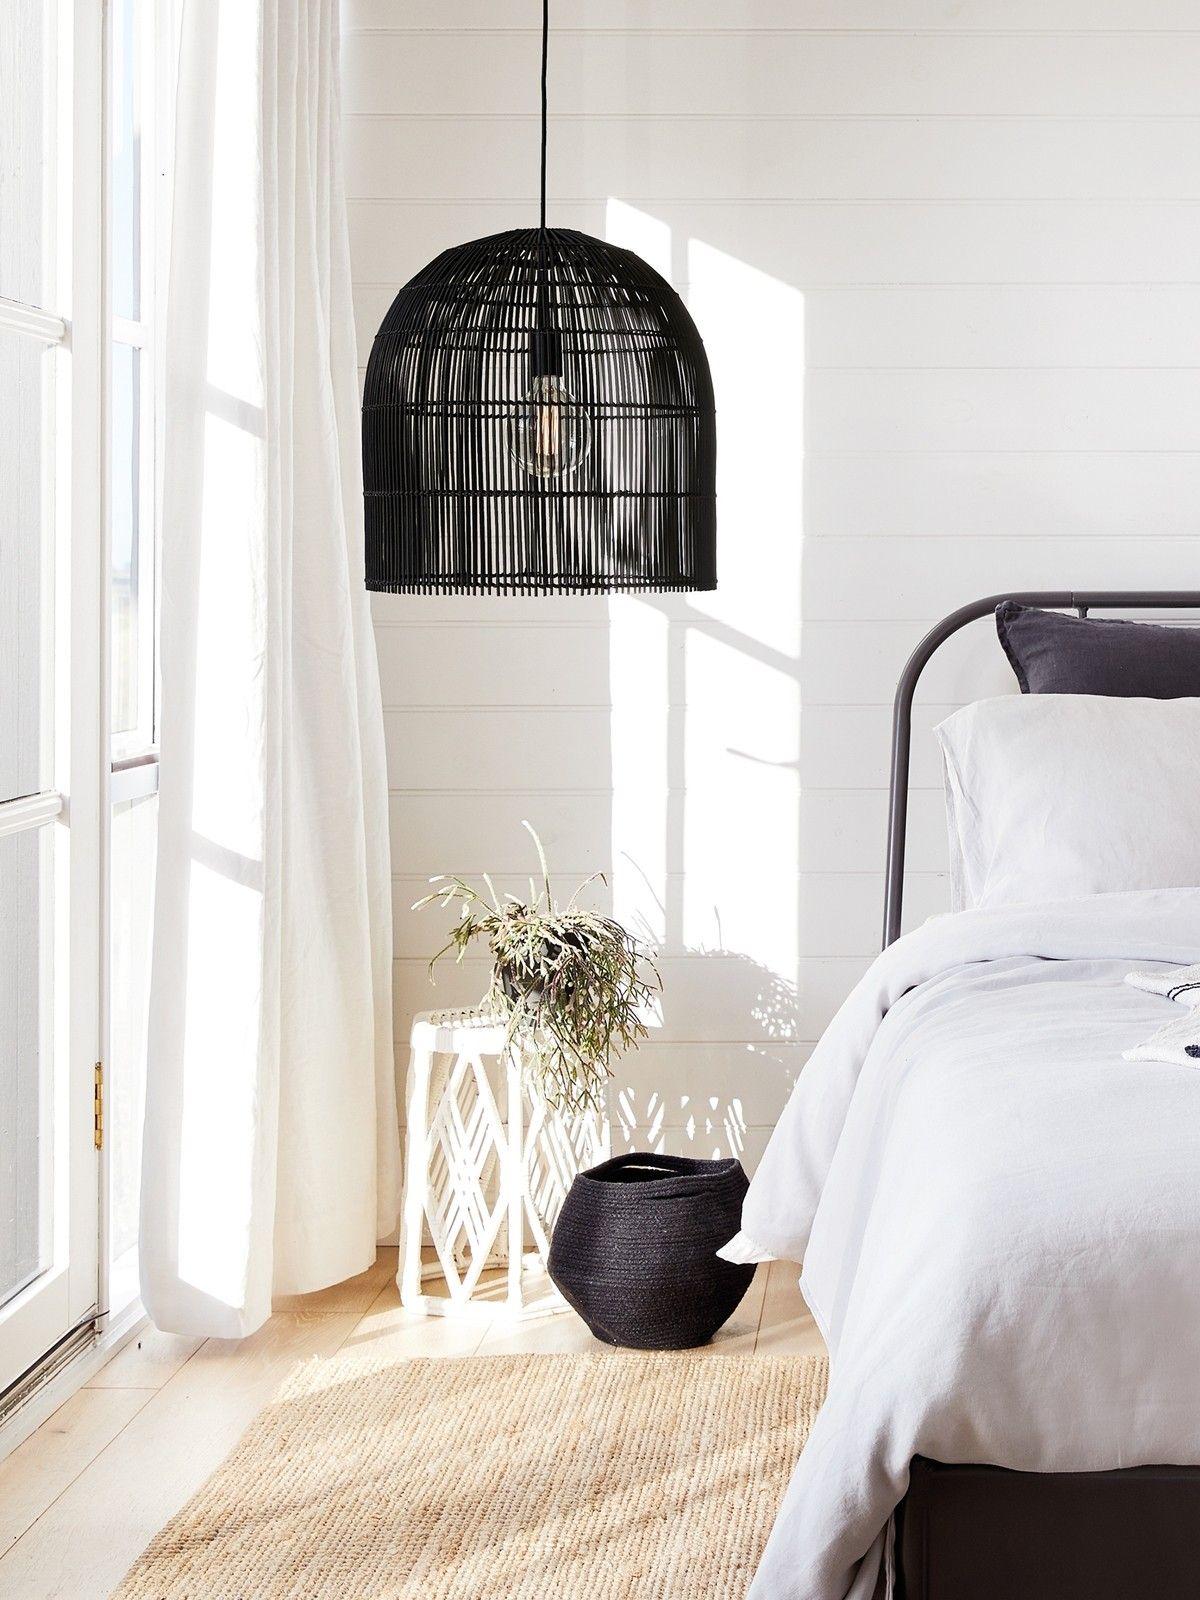 Herman 1 Light 350mm Tall Pendant In Black Classic Bedroom Adjustable Pendant Light Bedroom Lighting